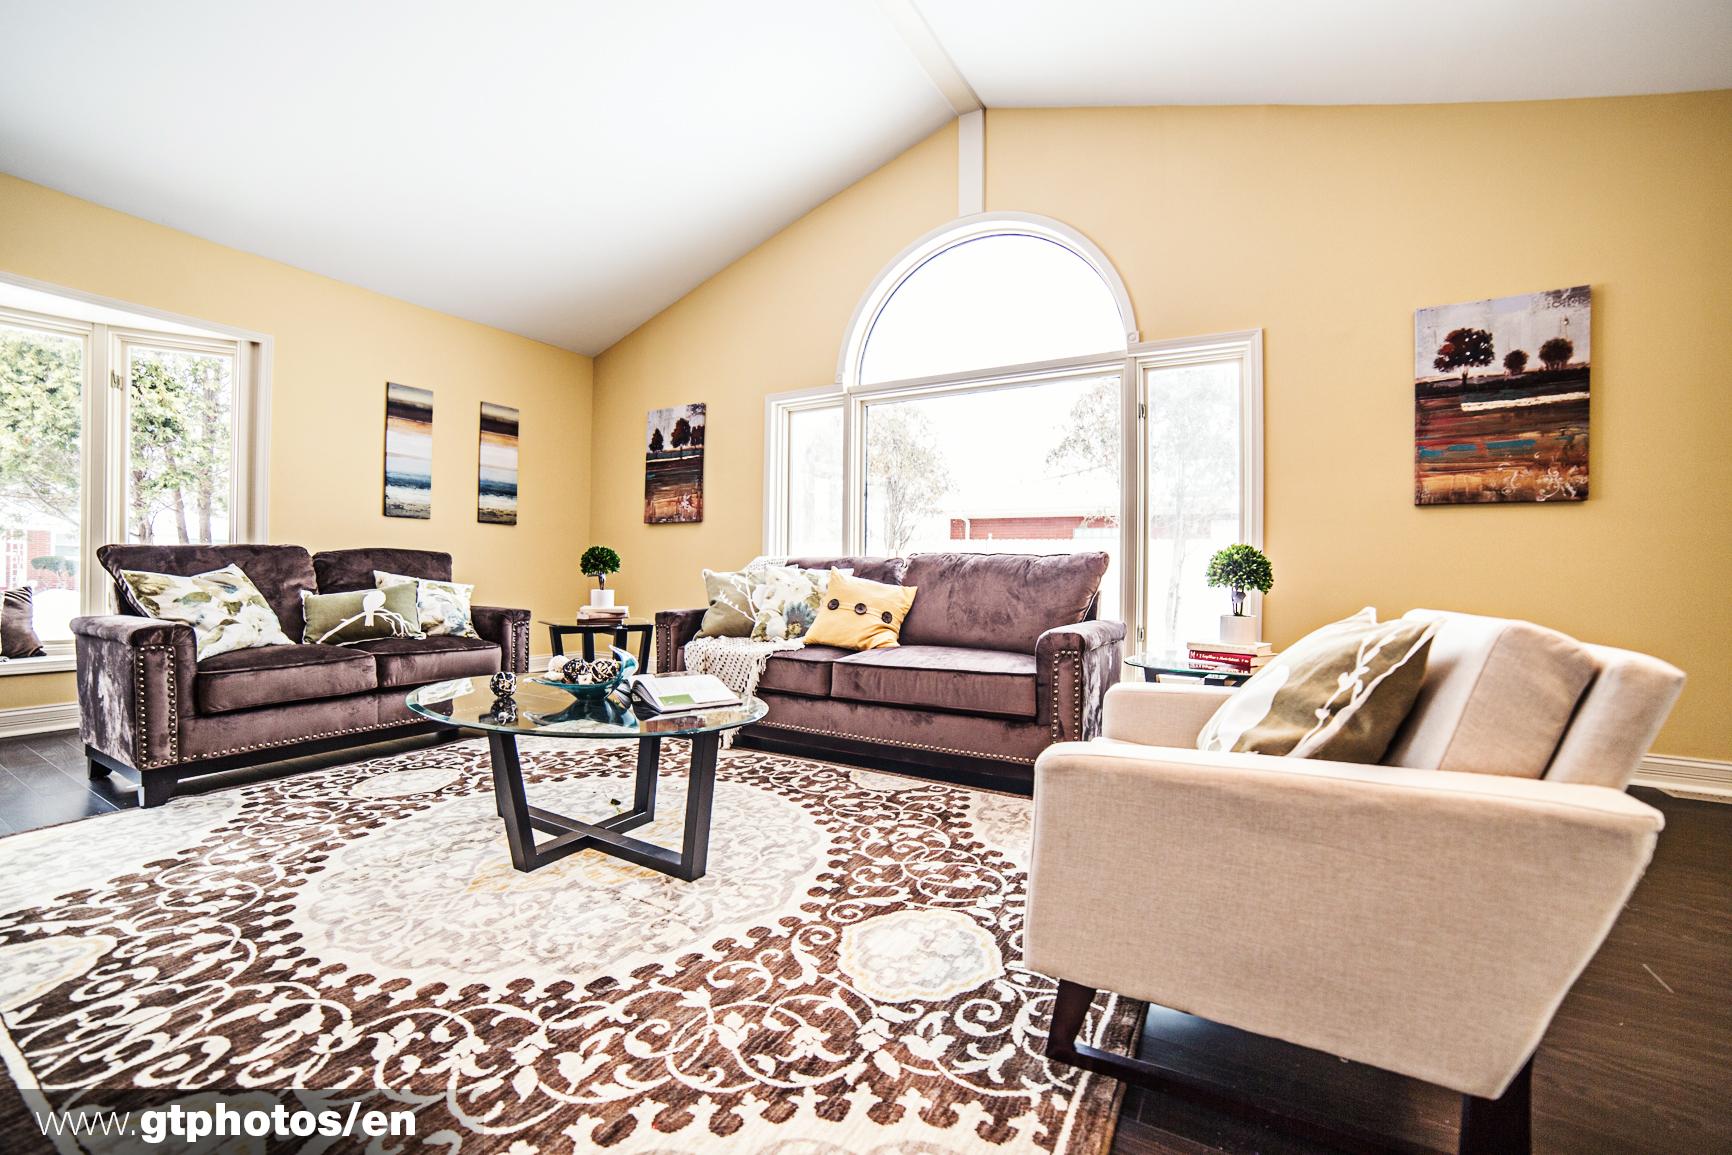 Living Room Renovation Budget